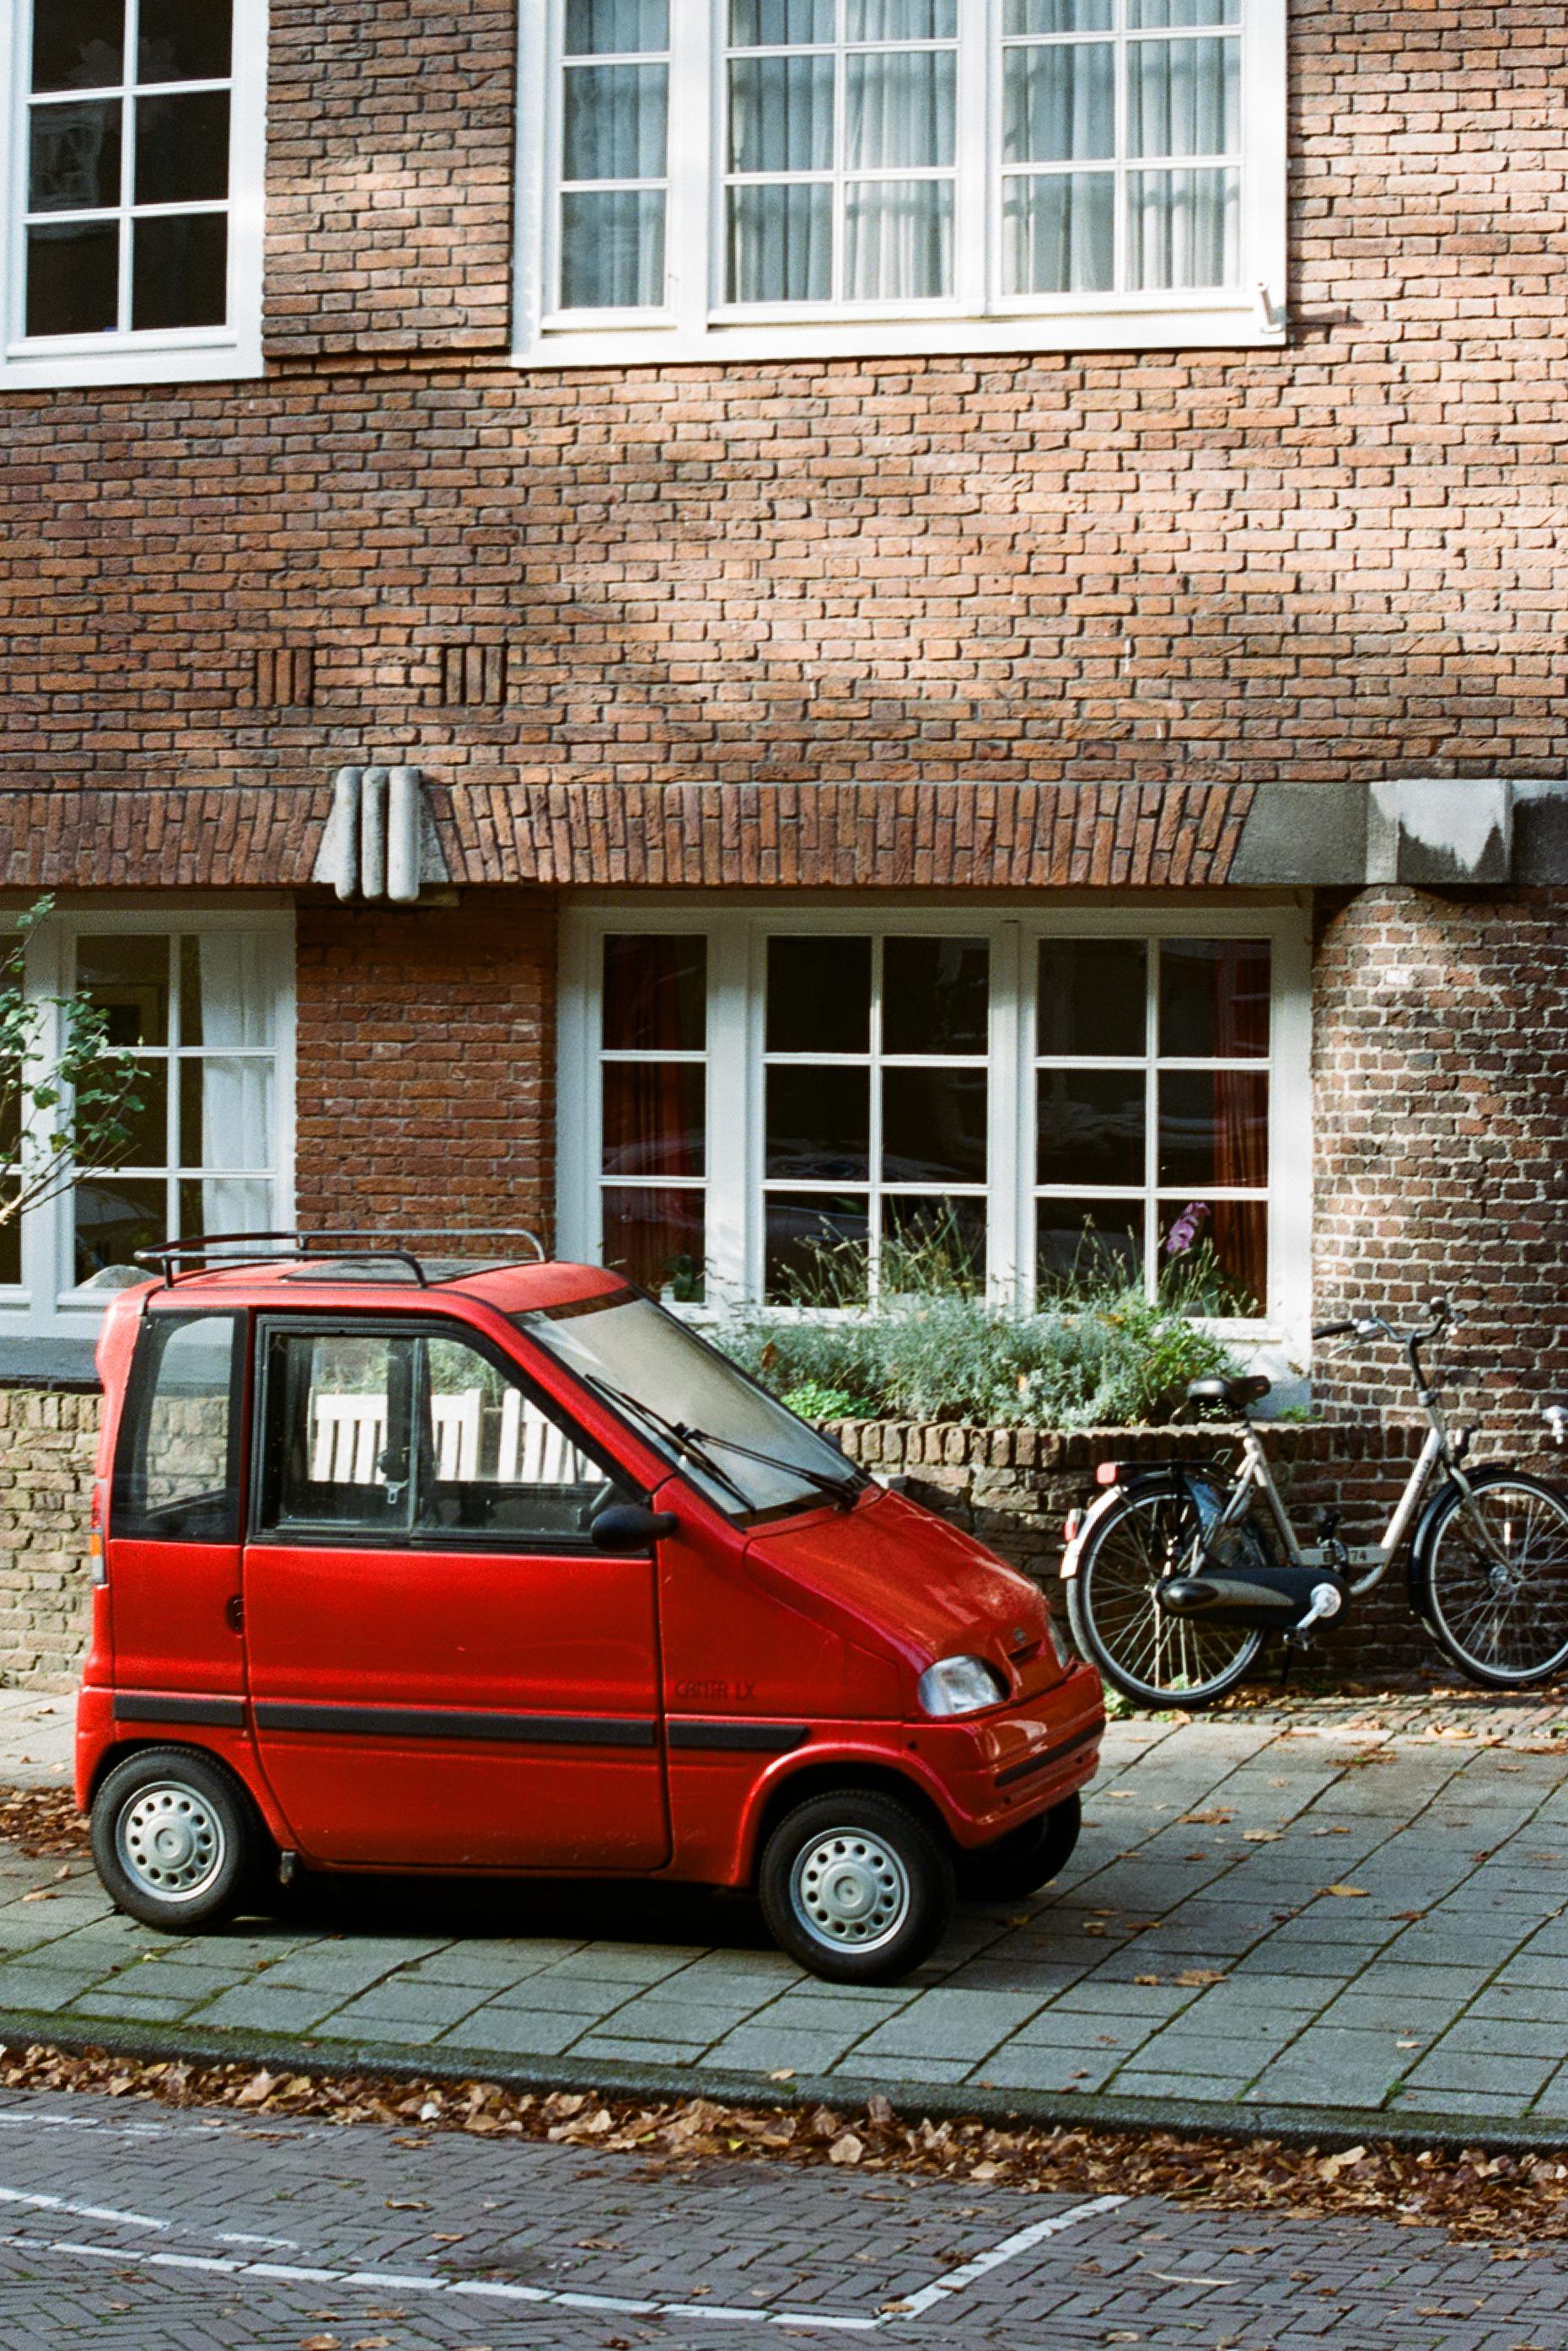 Amsterdam_0045 copy.jpg